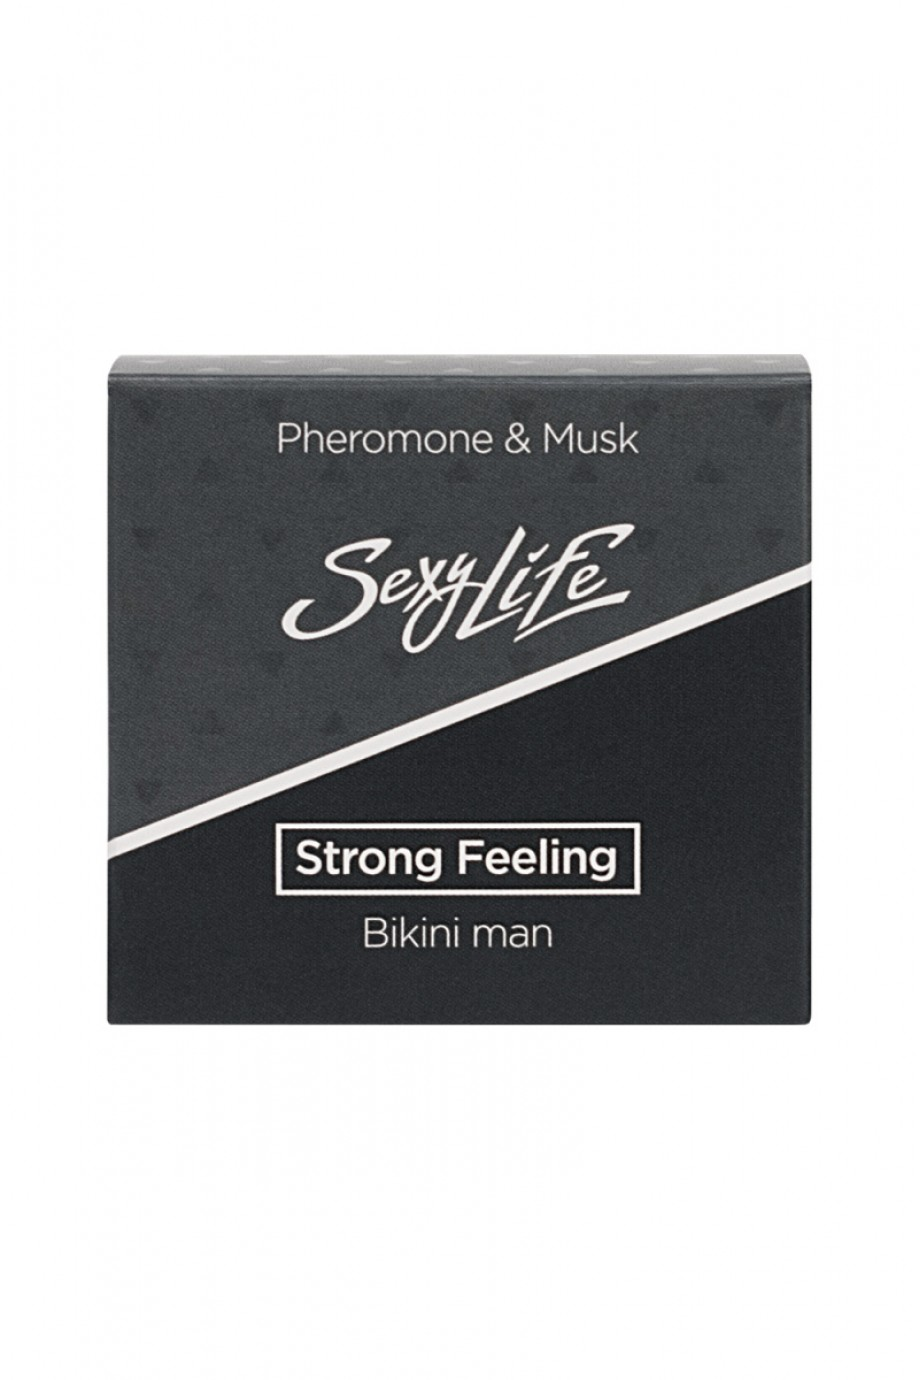 "Духи для бикини ""Sexy Life"" концентрированные, с феромонами Strong Feeling муж. 5 мл"